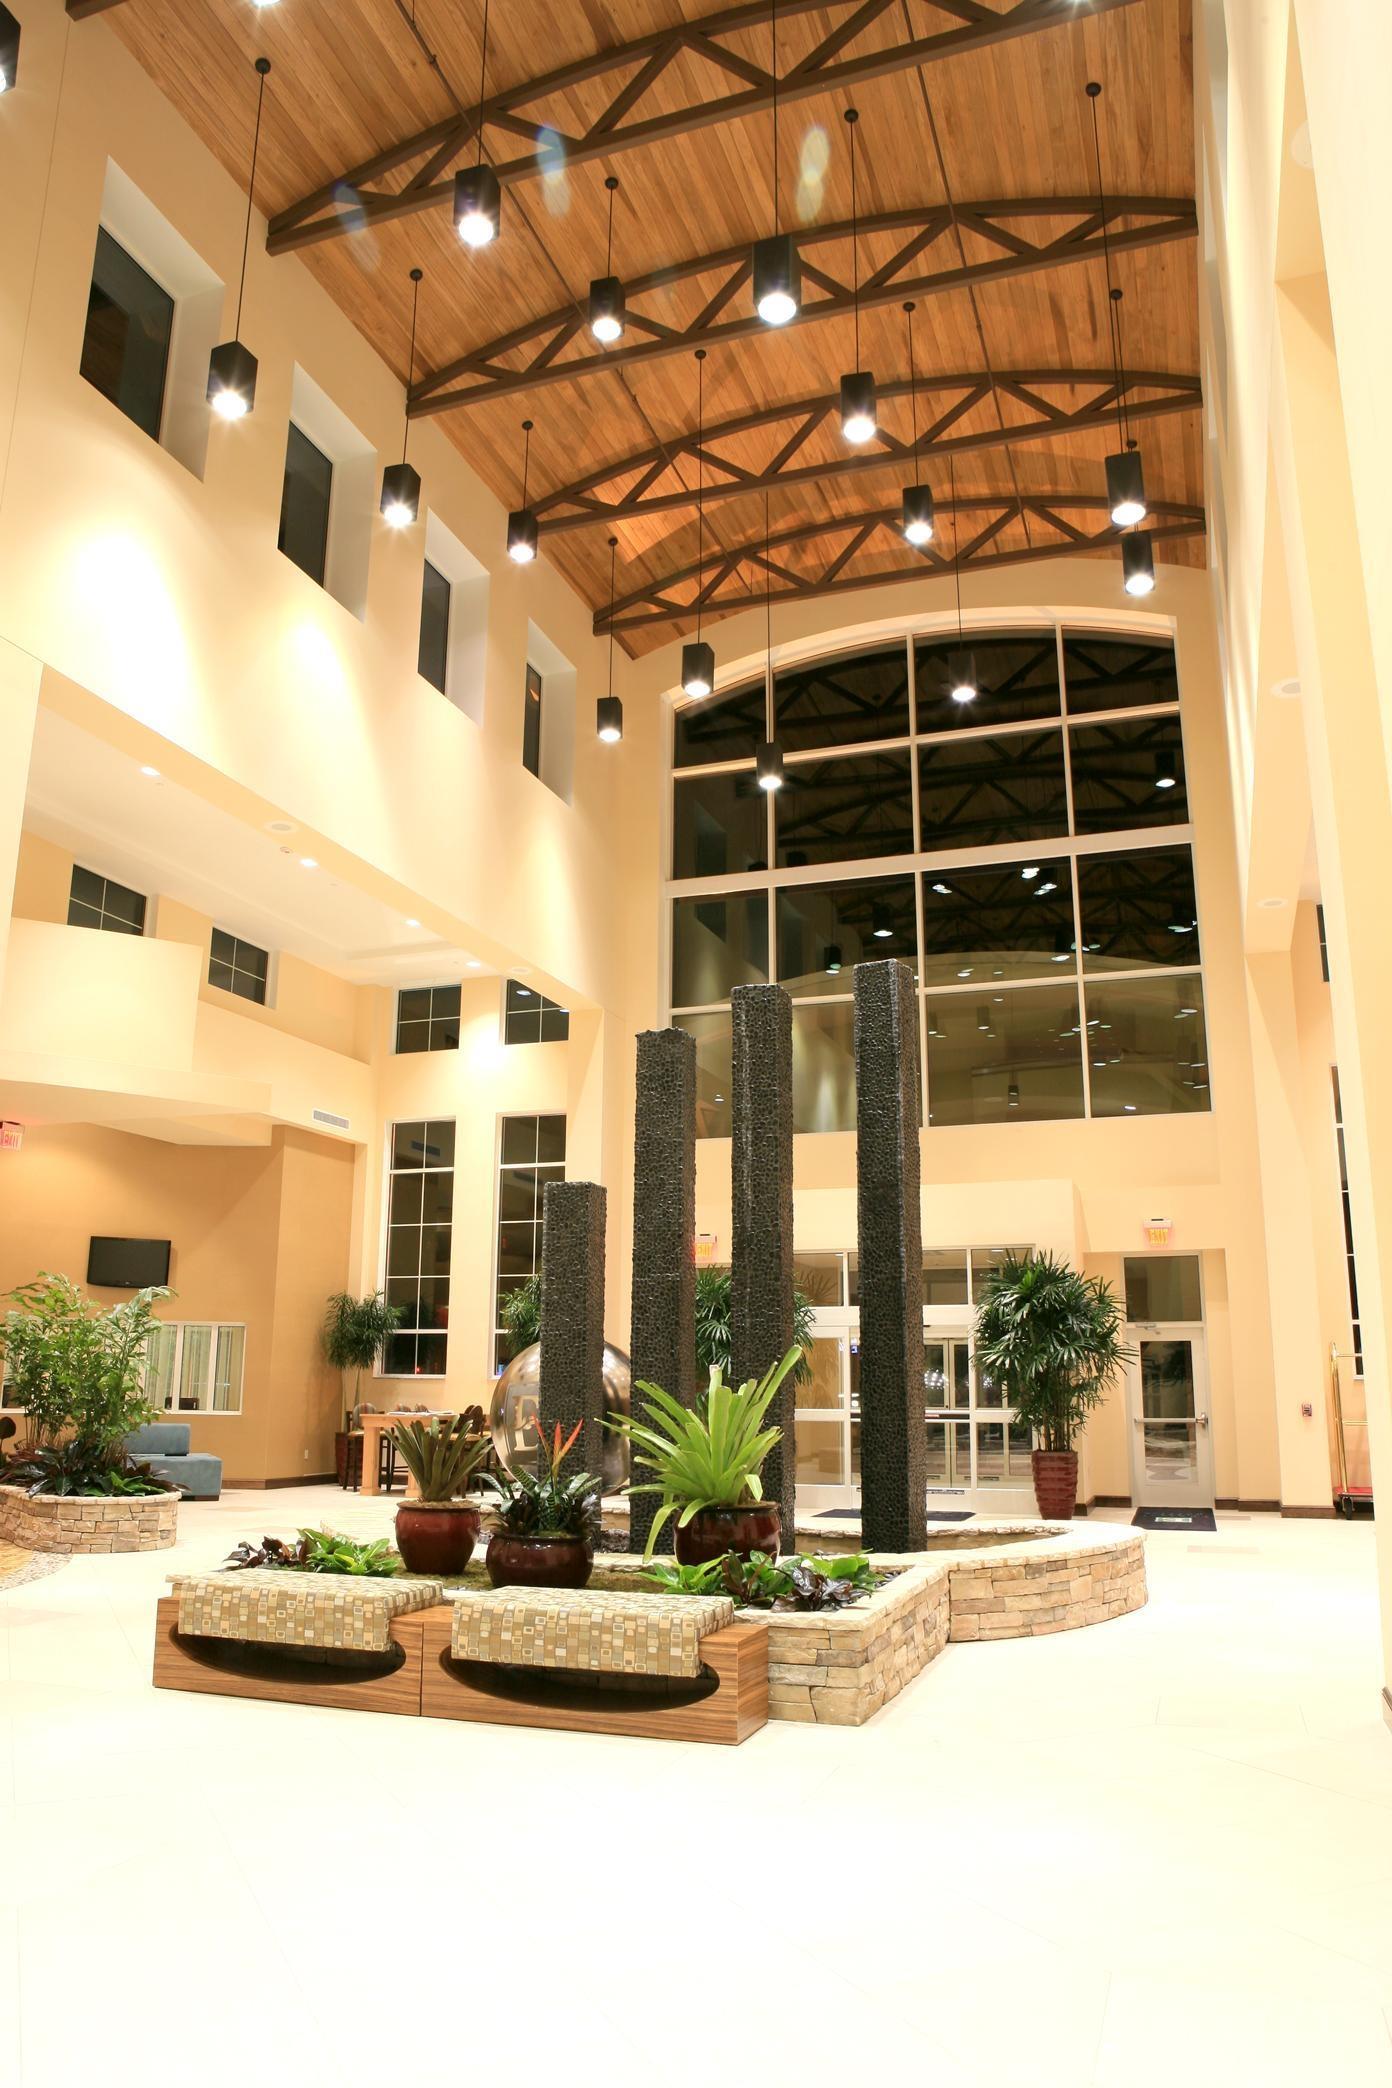 Embassy Suites by Hilton Birmingham Hoover image 10